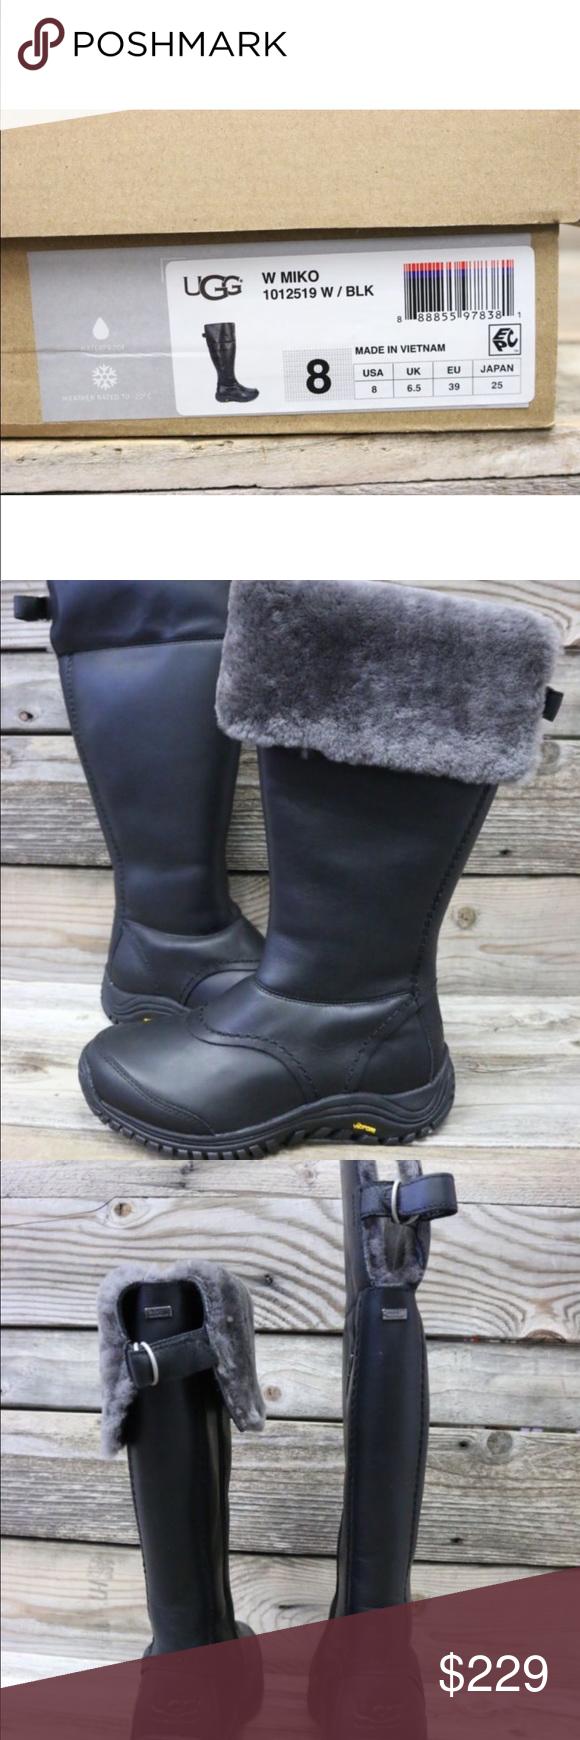 aa7b43e45eb UGG Shoes   Ugg Miko Black Grey Snow Rain Waterproof Boots New ...